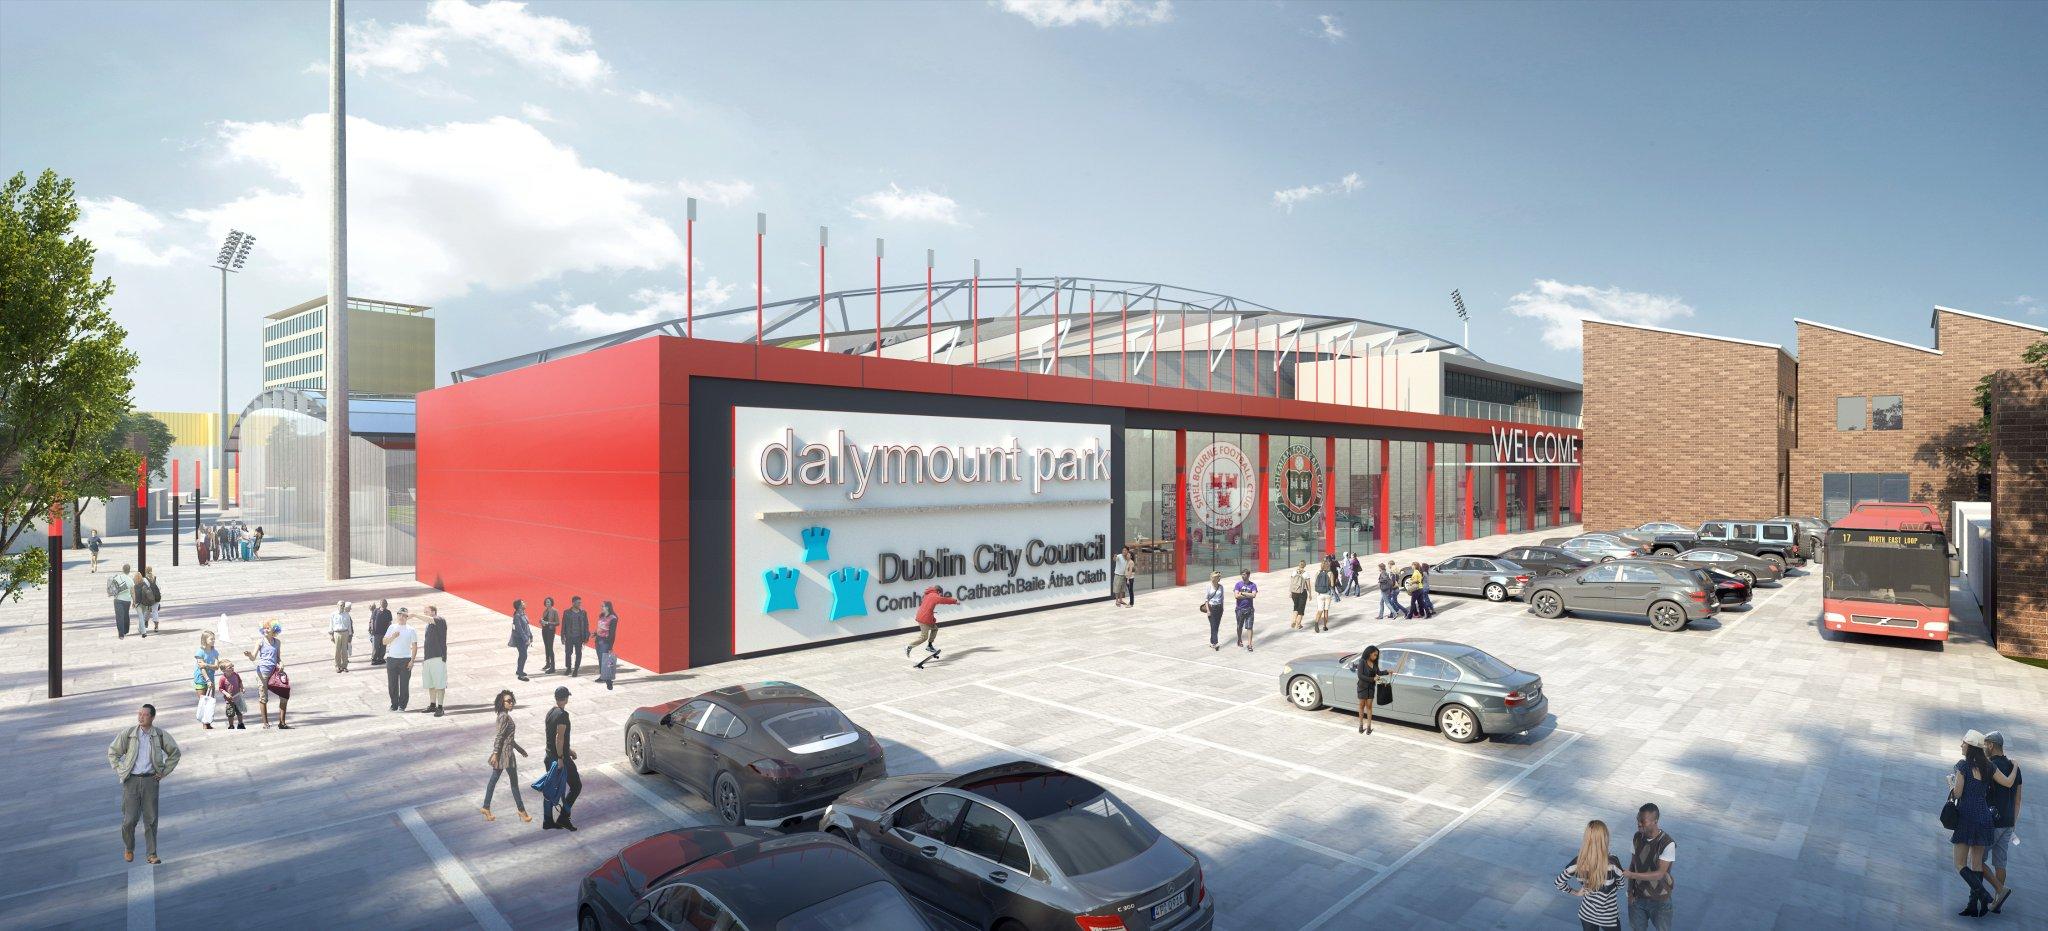 Design: Dalymount Park – StadiumDB com